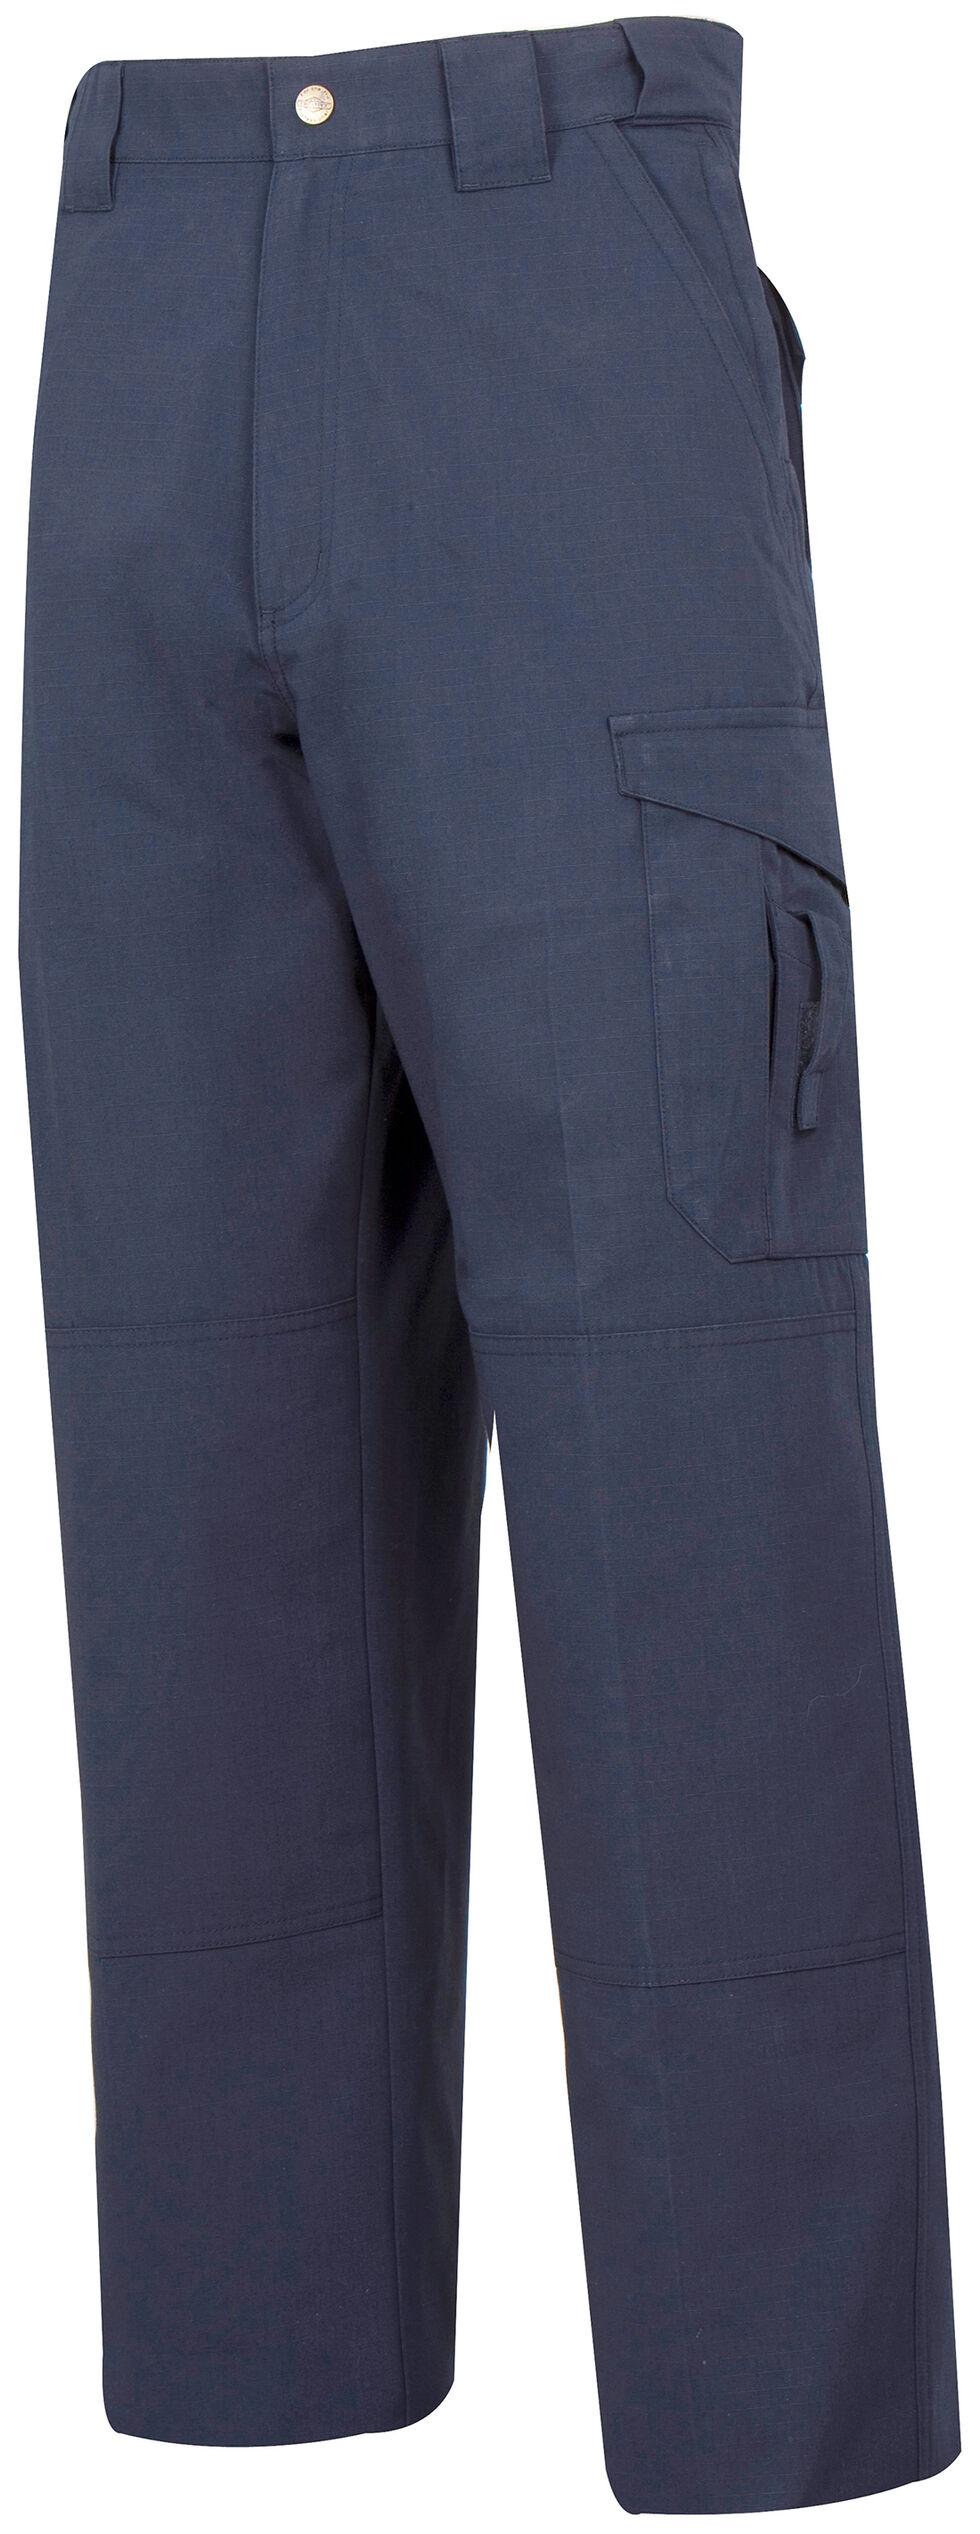 Tru-Spec Men's 24-7 Series EMS Pants, Navy, hi-res